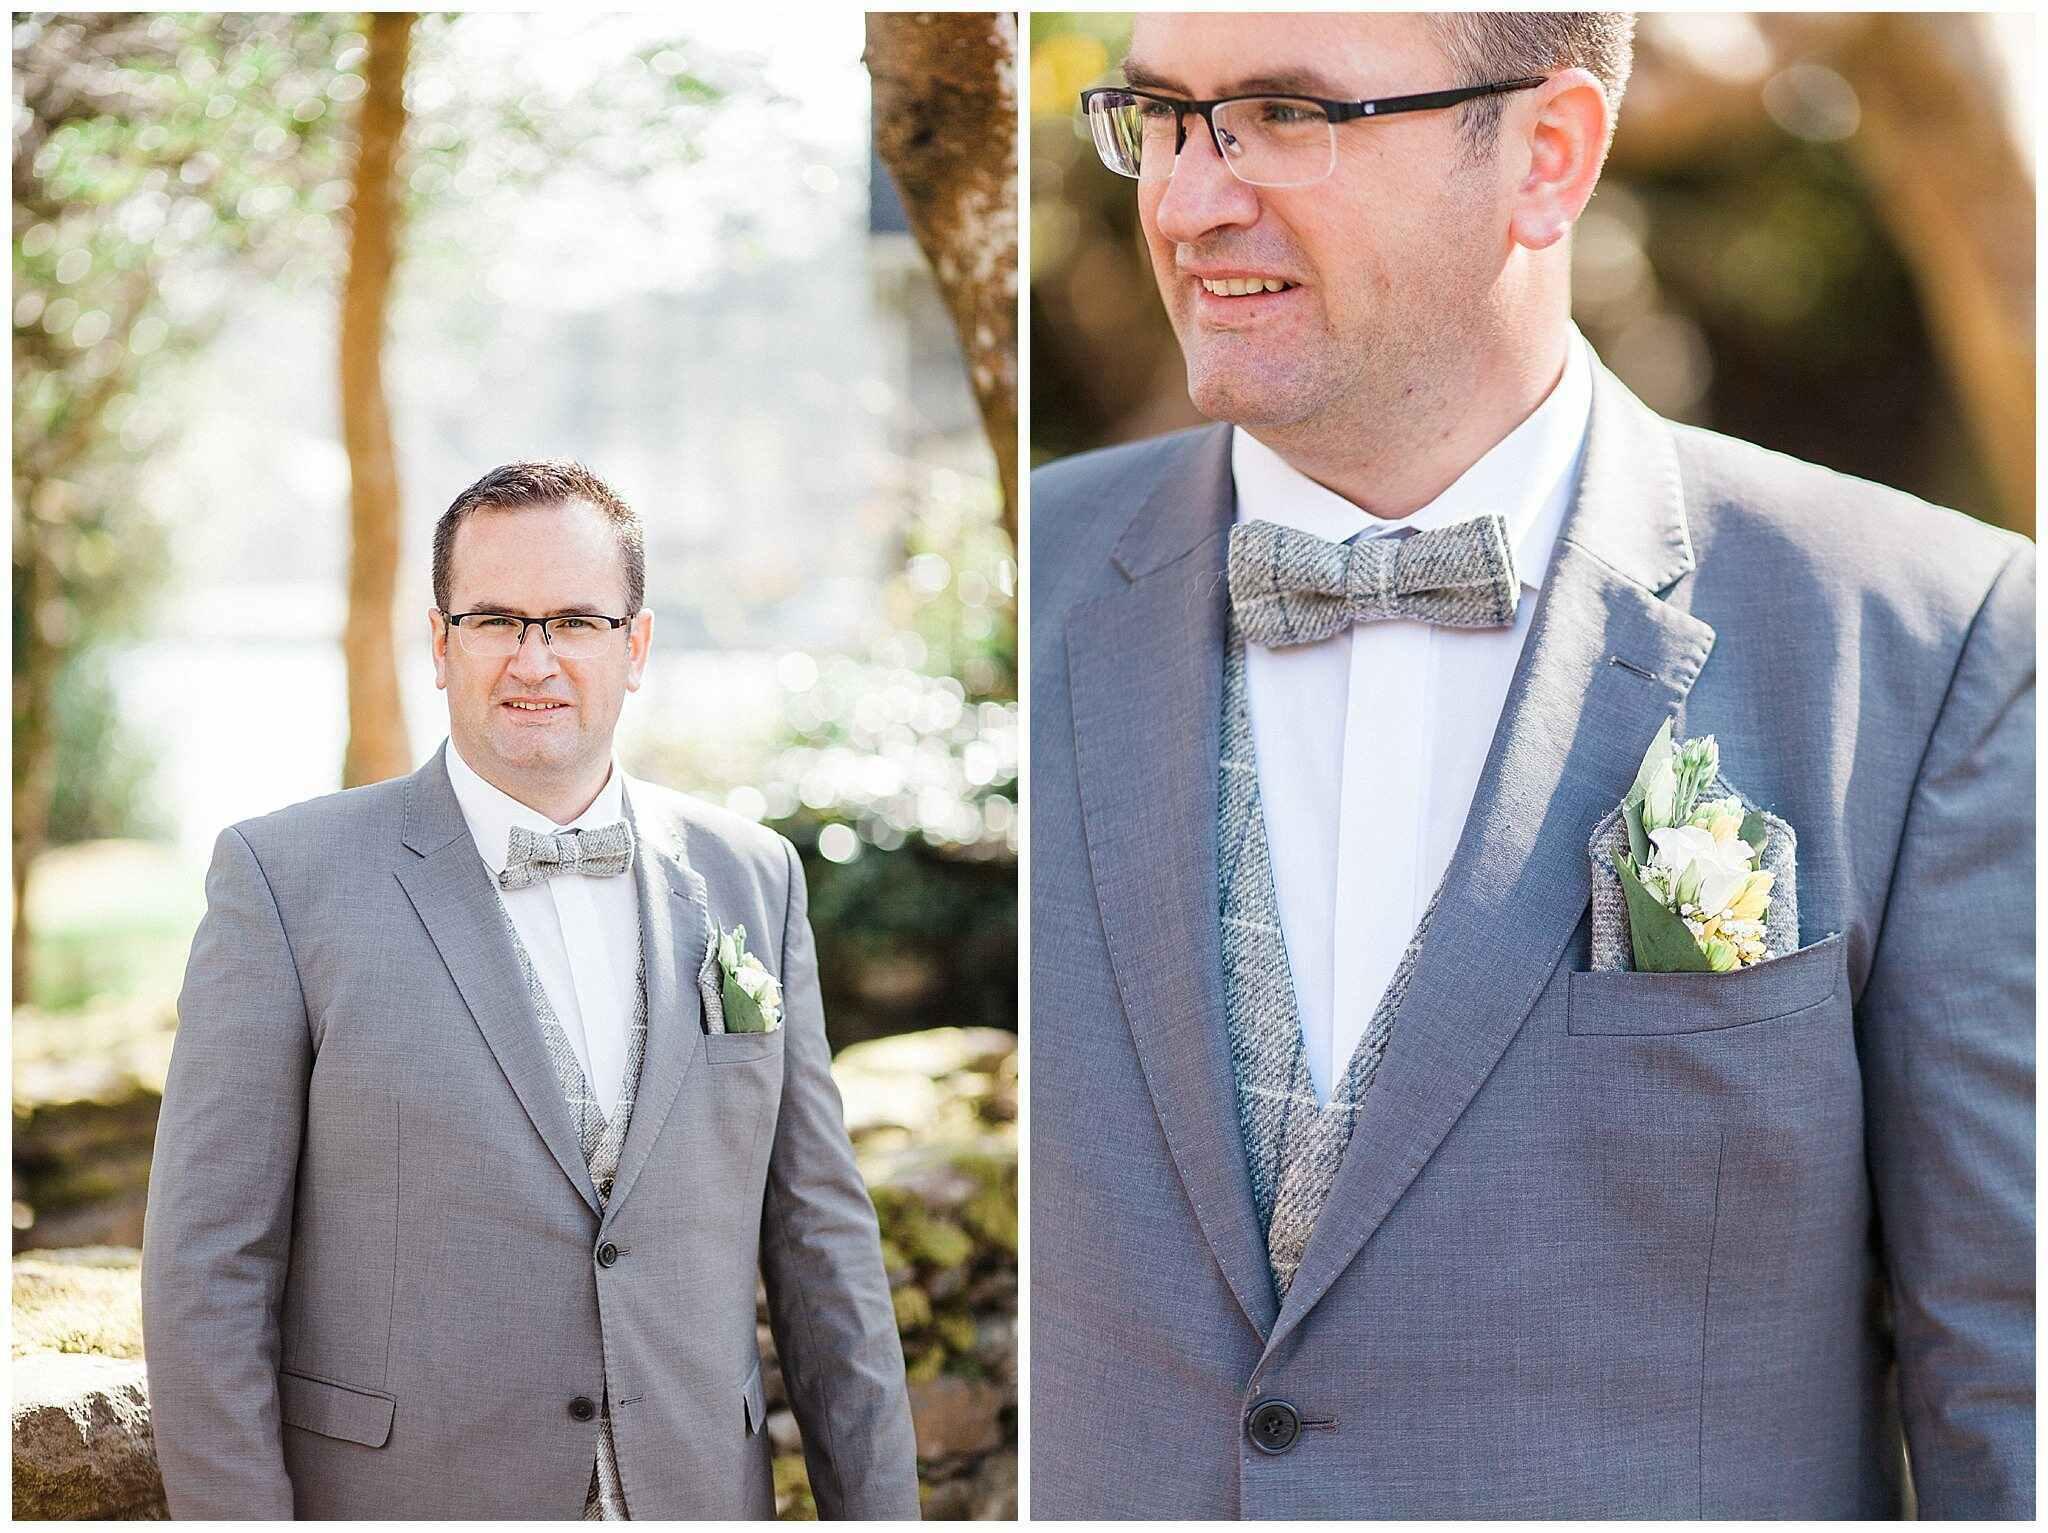 Deirdre + James wedding in Gougane Barra 3